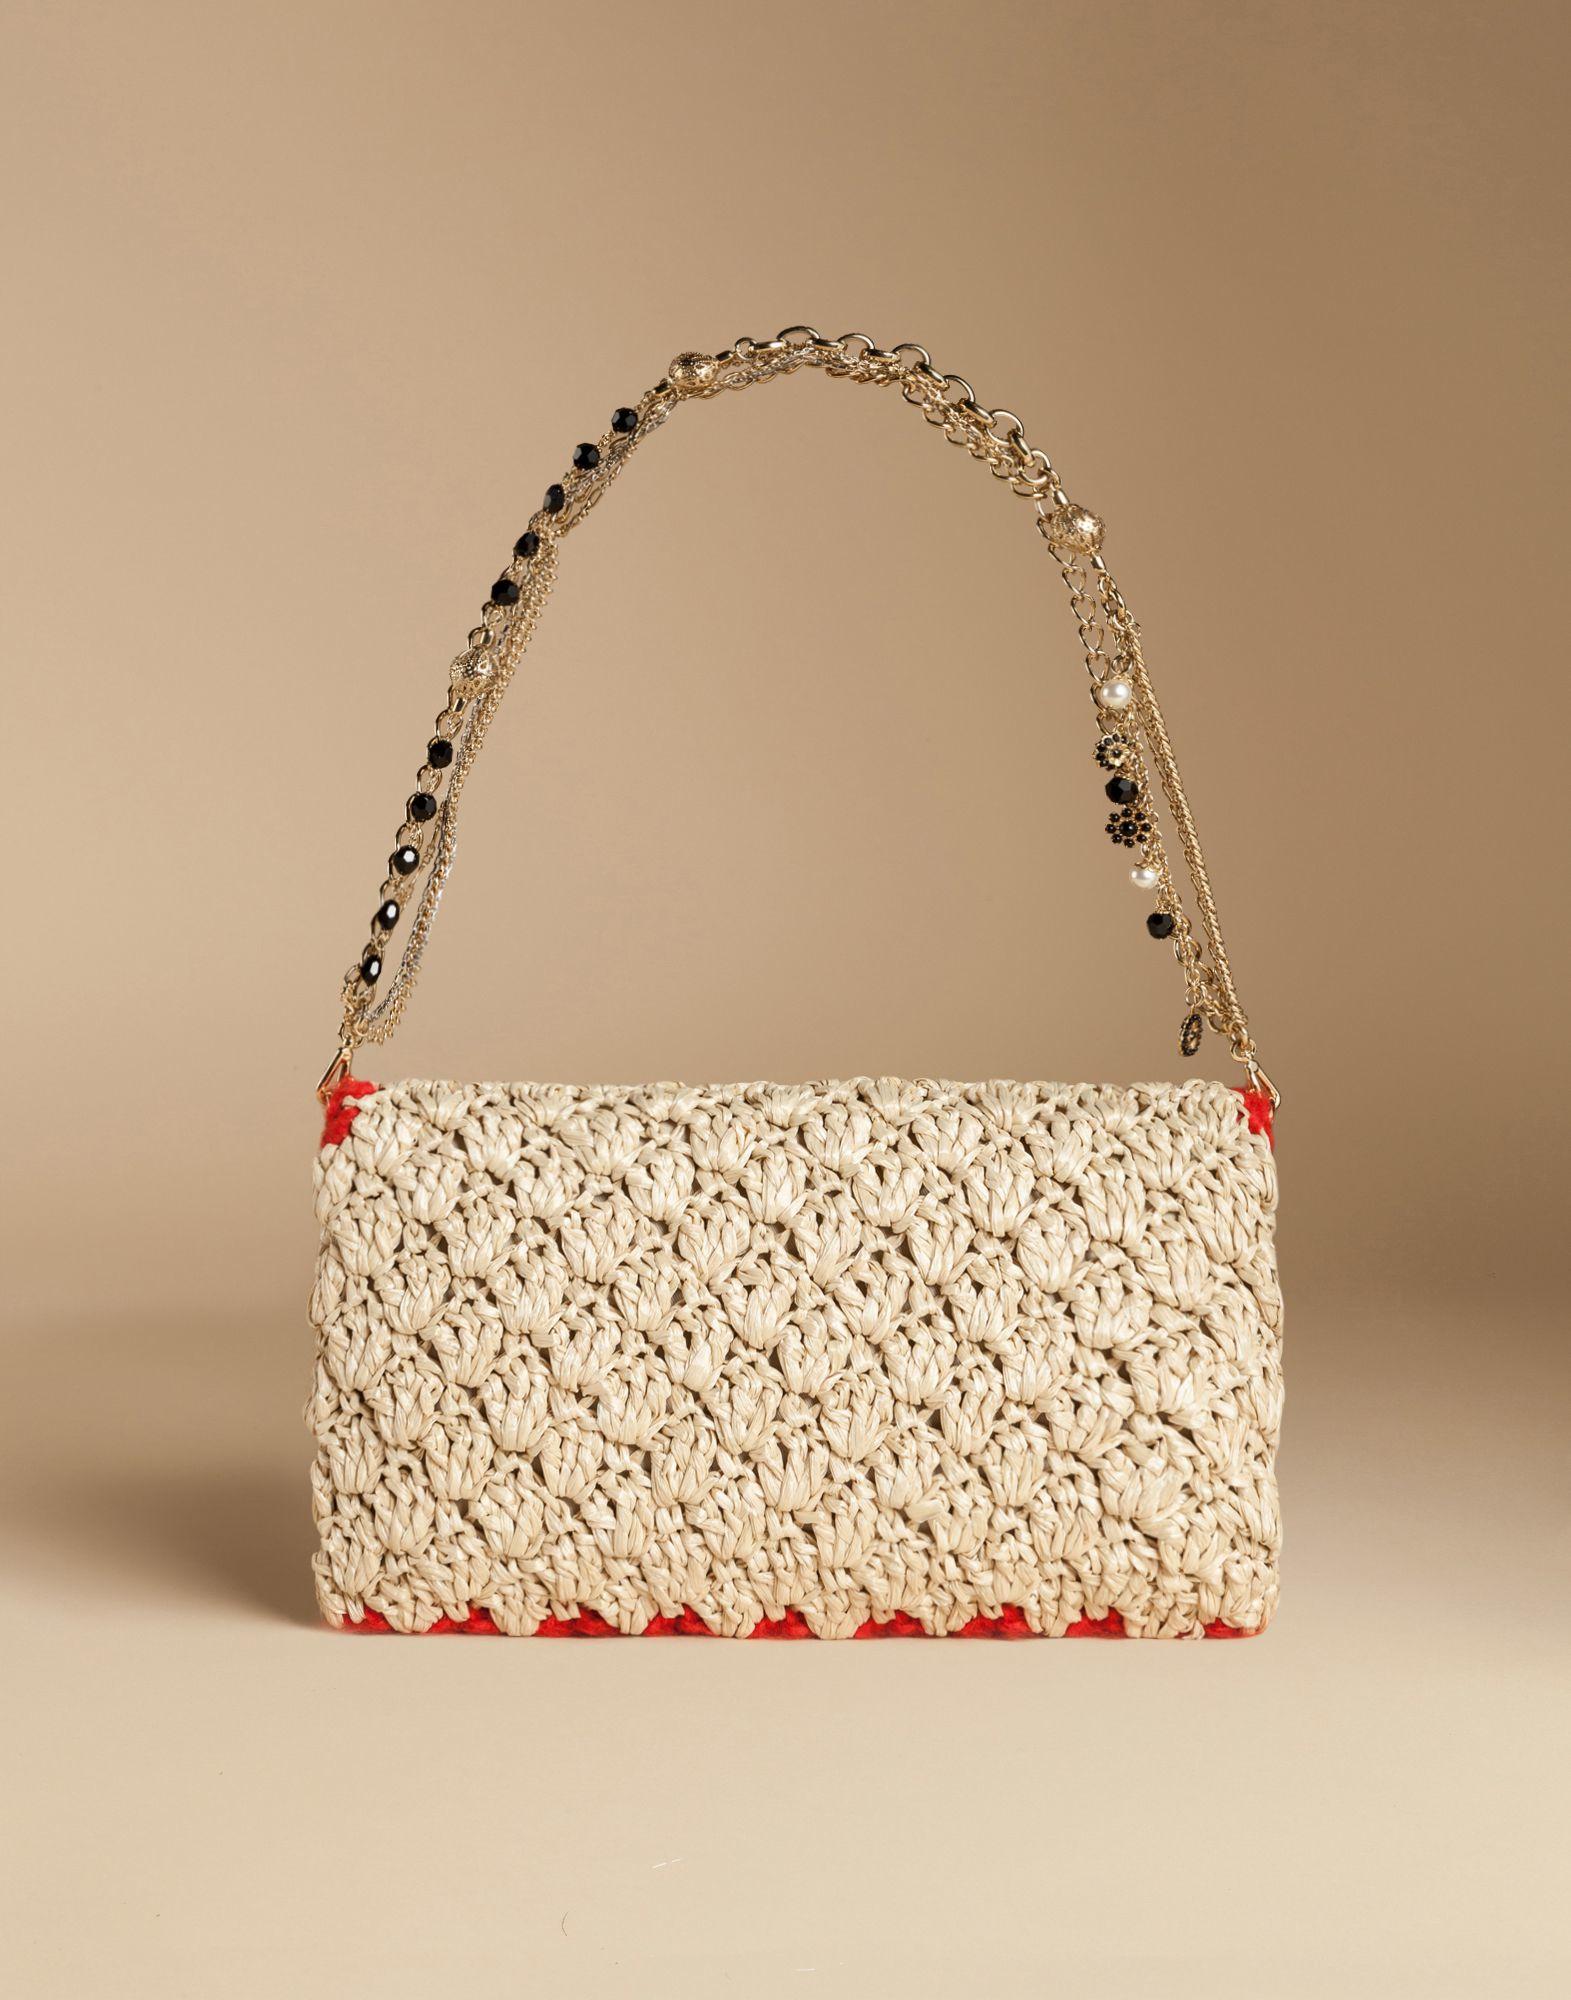 af73febaab Lyst - Dolce   Gabbana Rosa Raffia Bag With Embroidery And Appliques